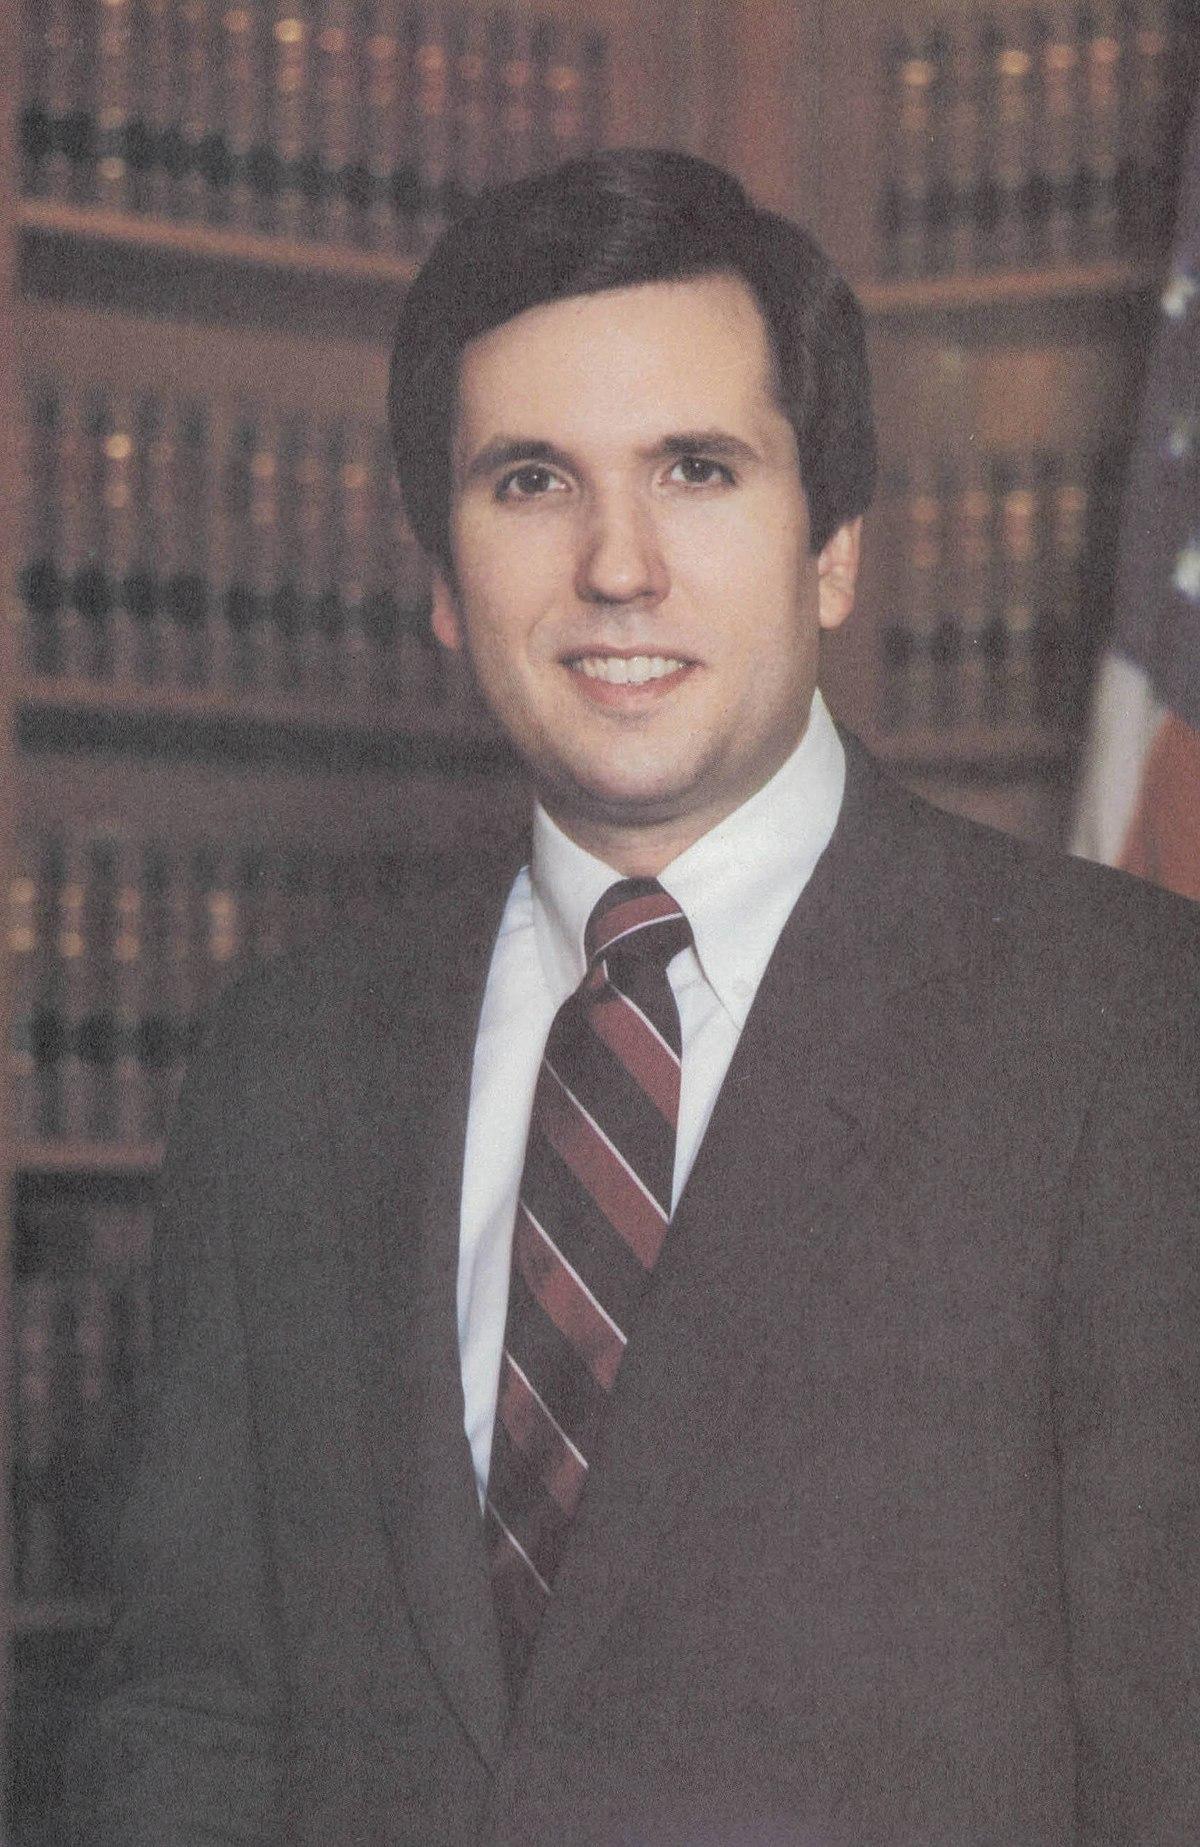 Missouri Attorney General Position On Travel Ban